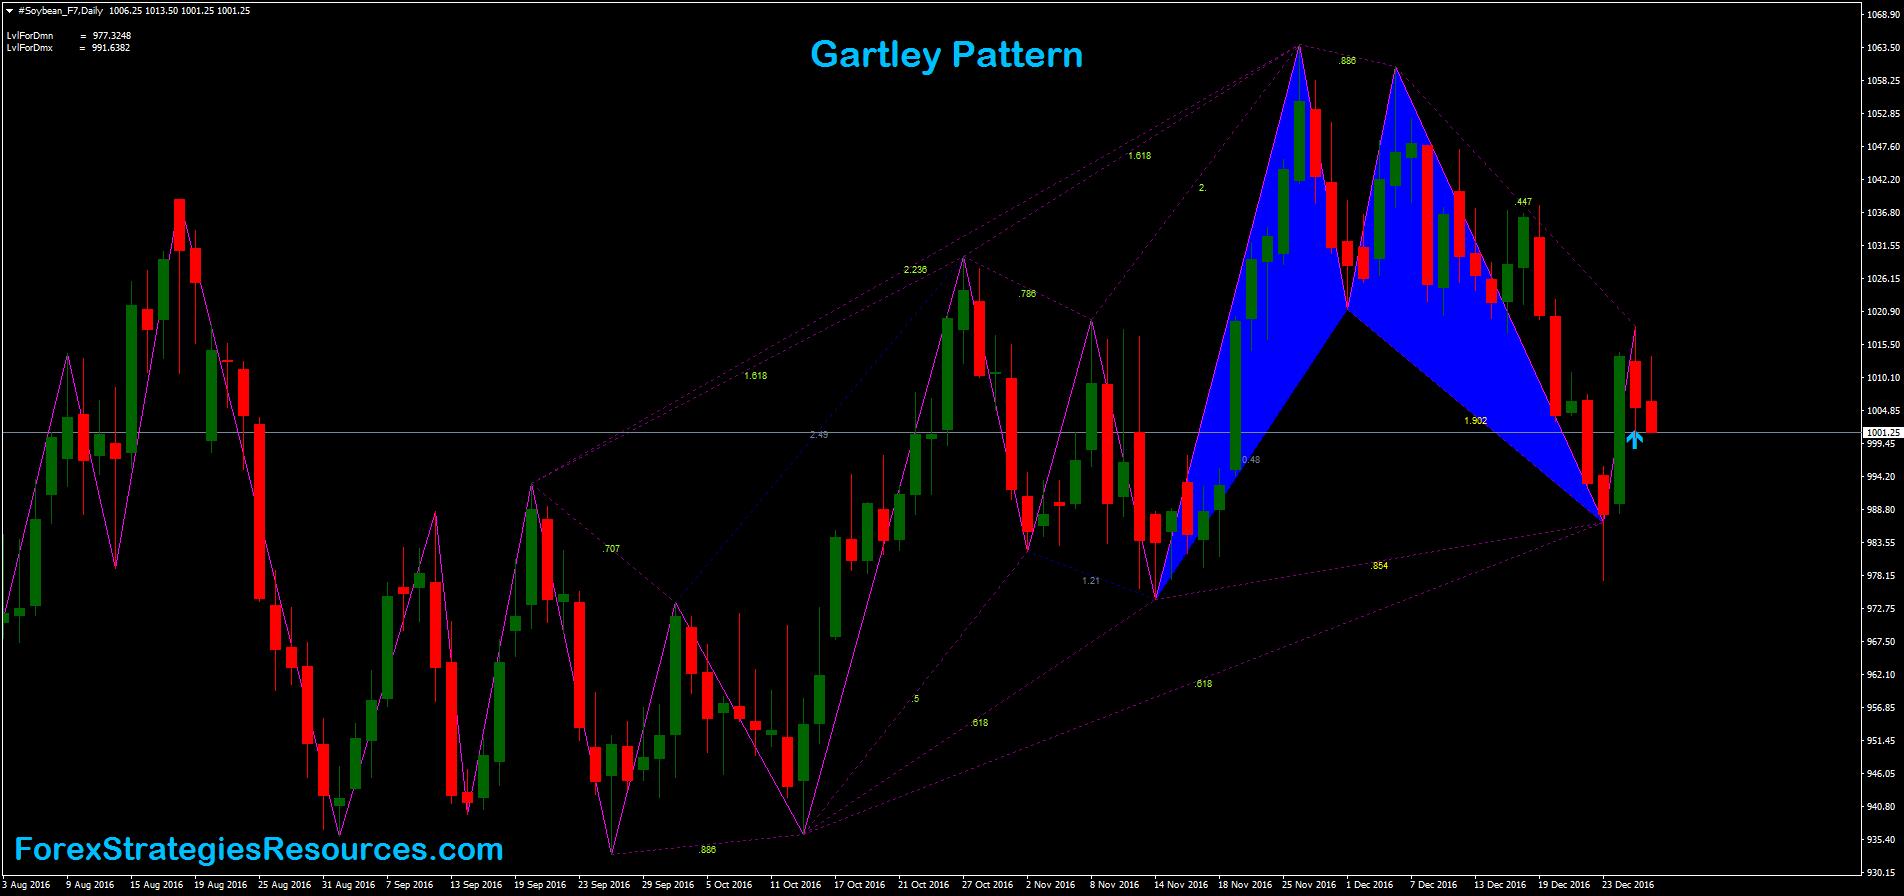 modele Gartley pentru opțiuni binare